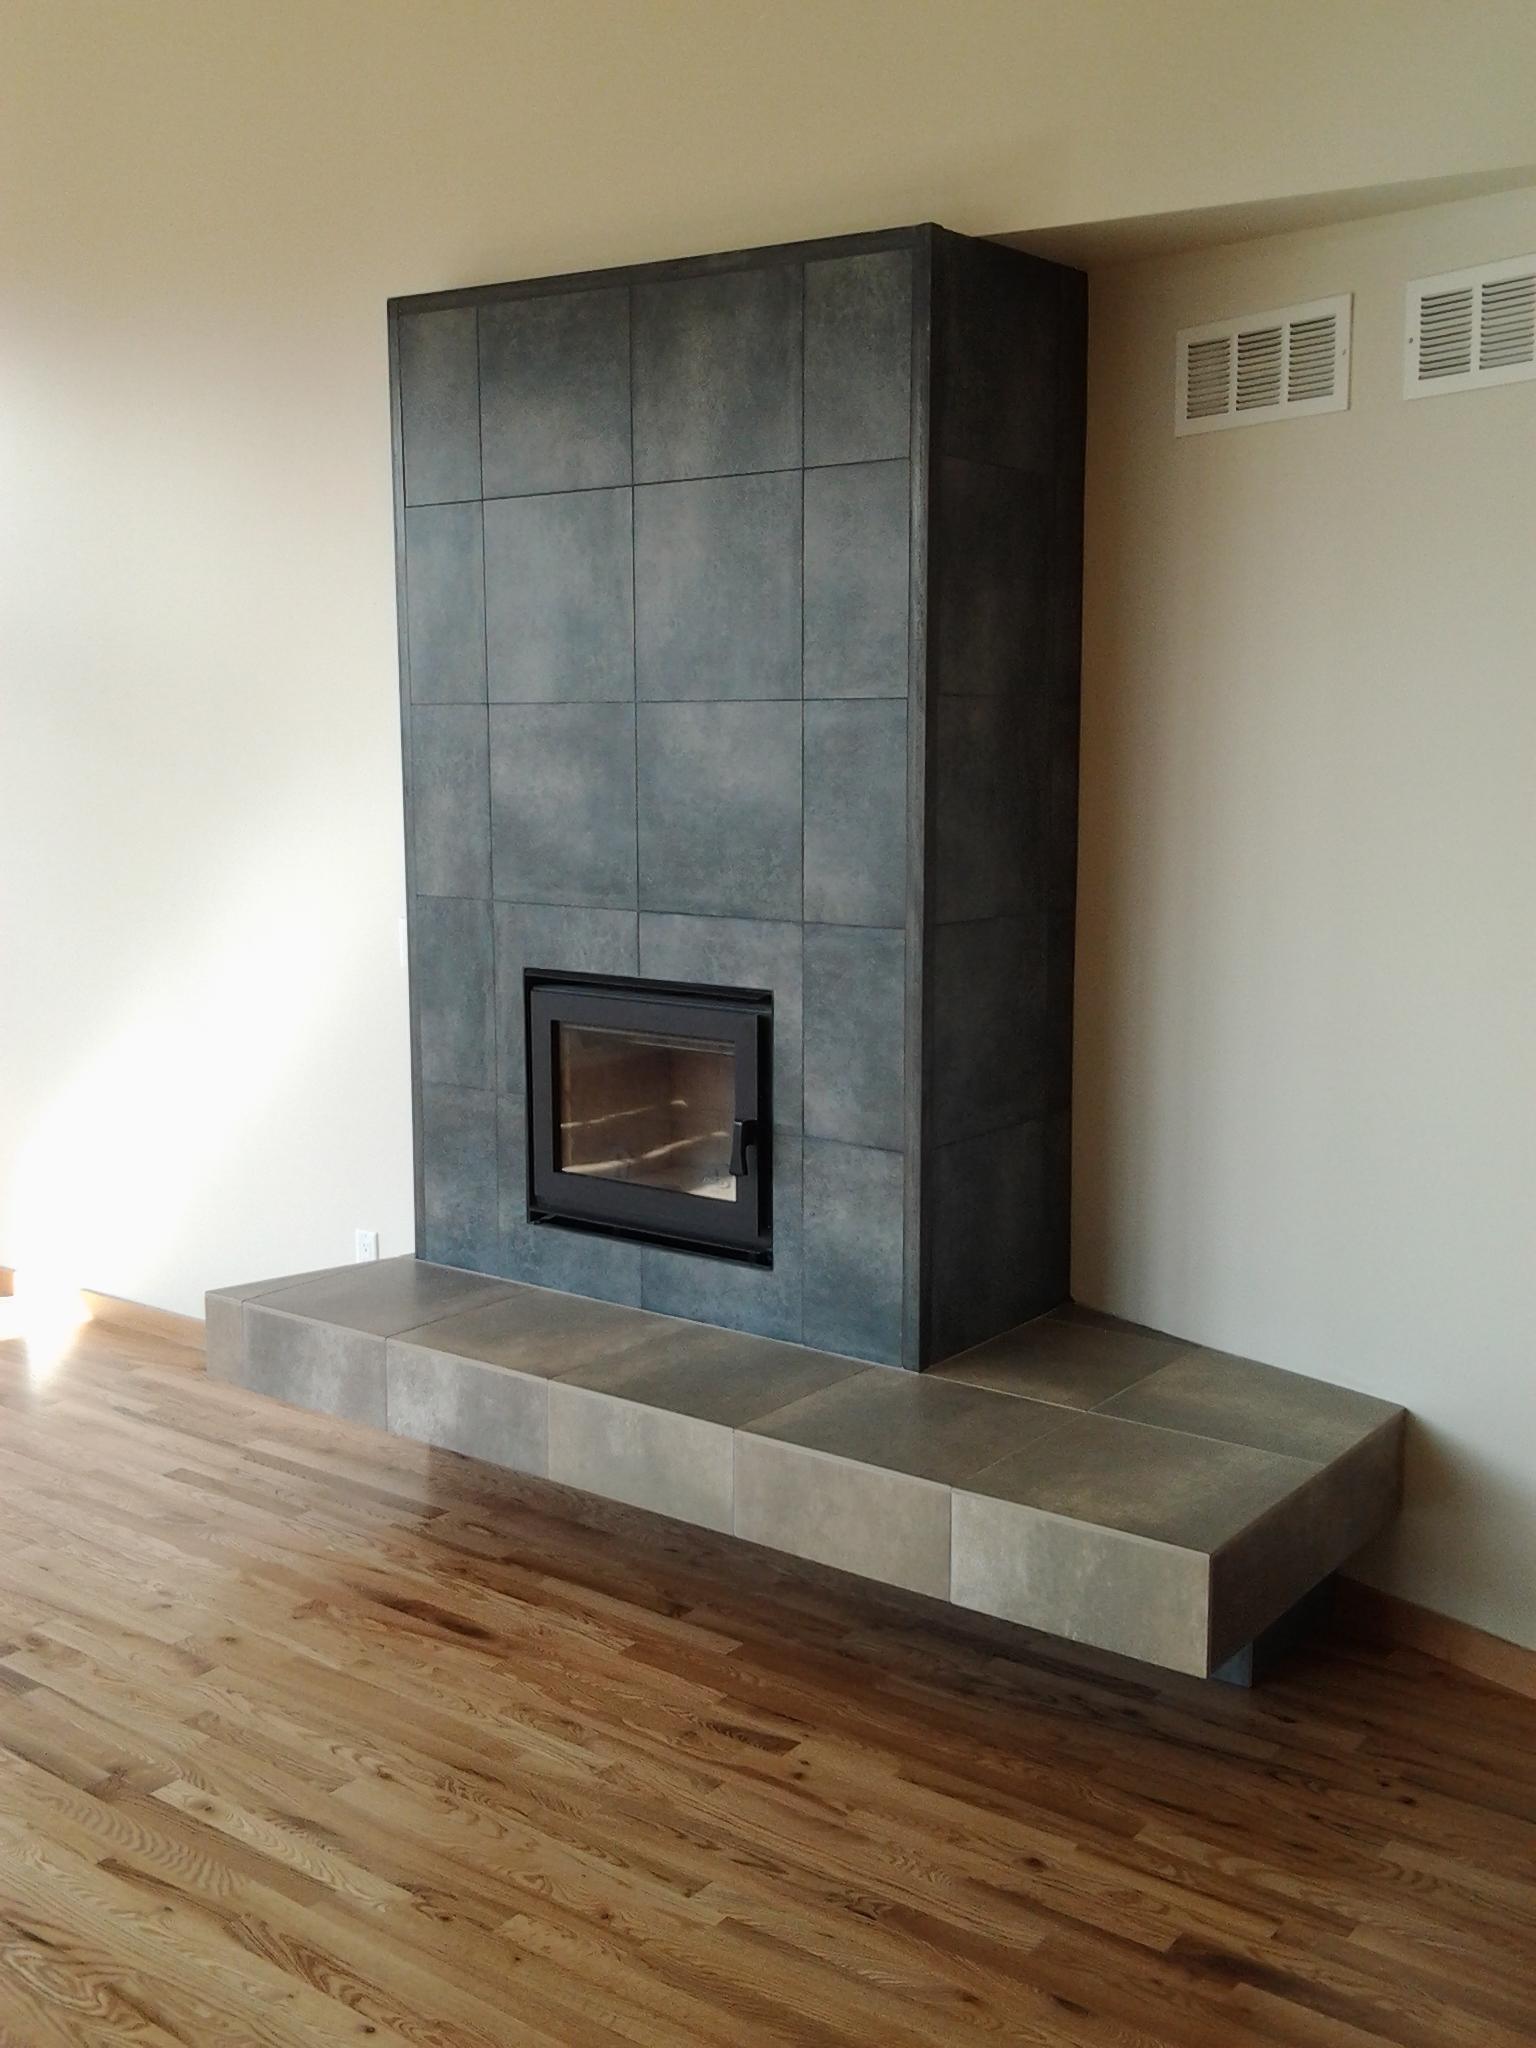 Metal framed porcelain fireplace with 'floating' bench.